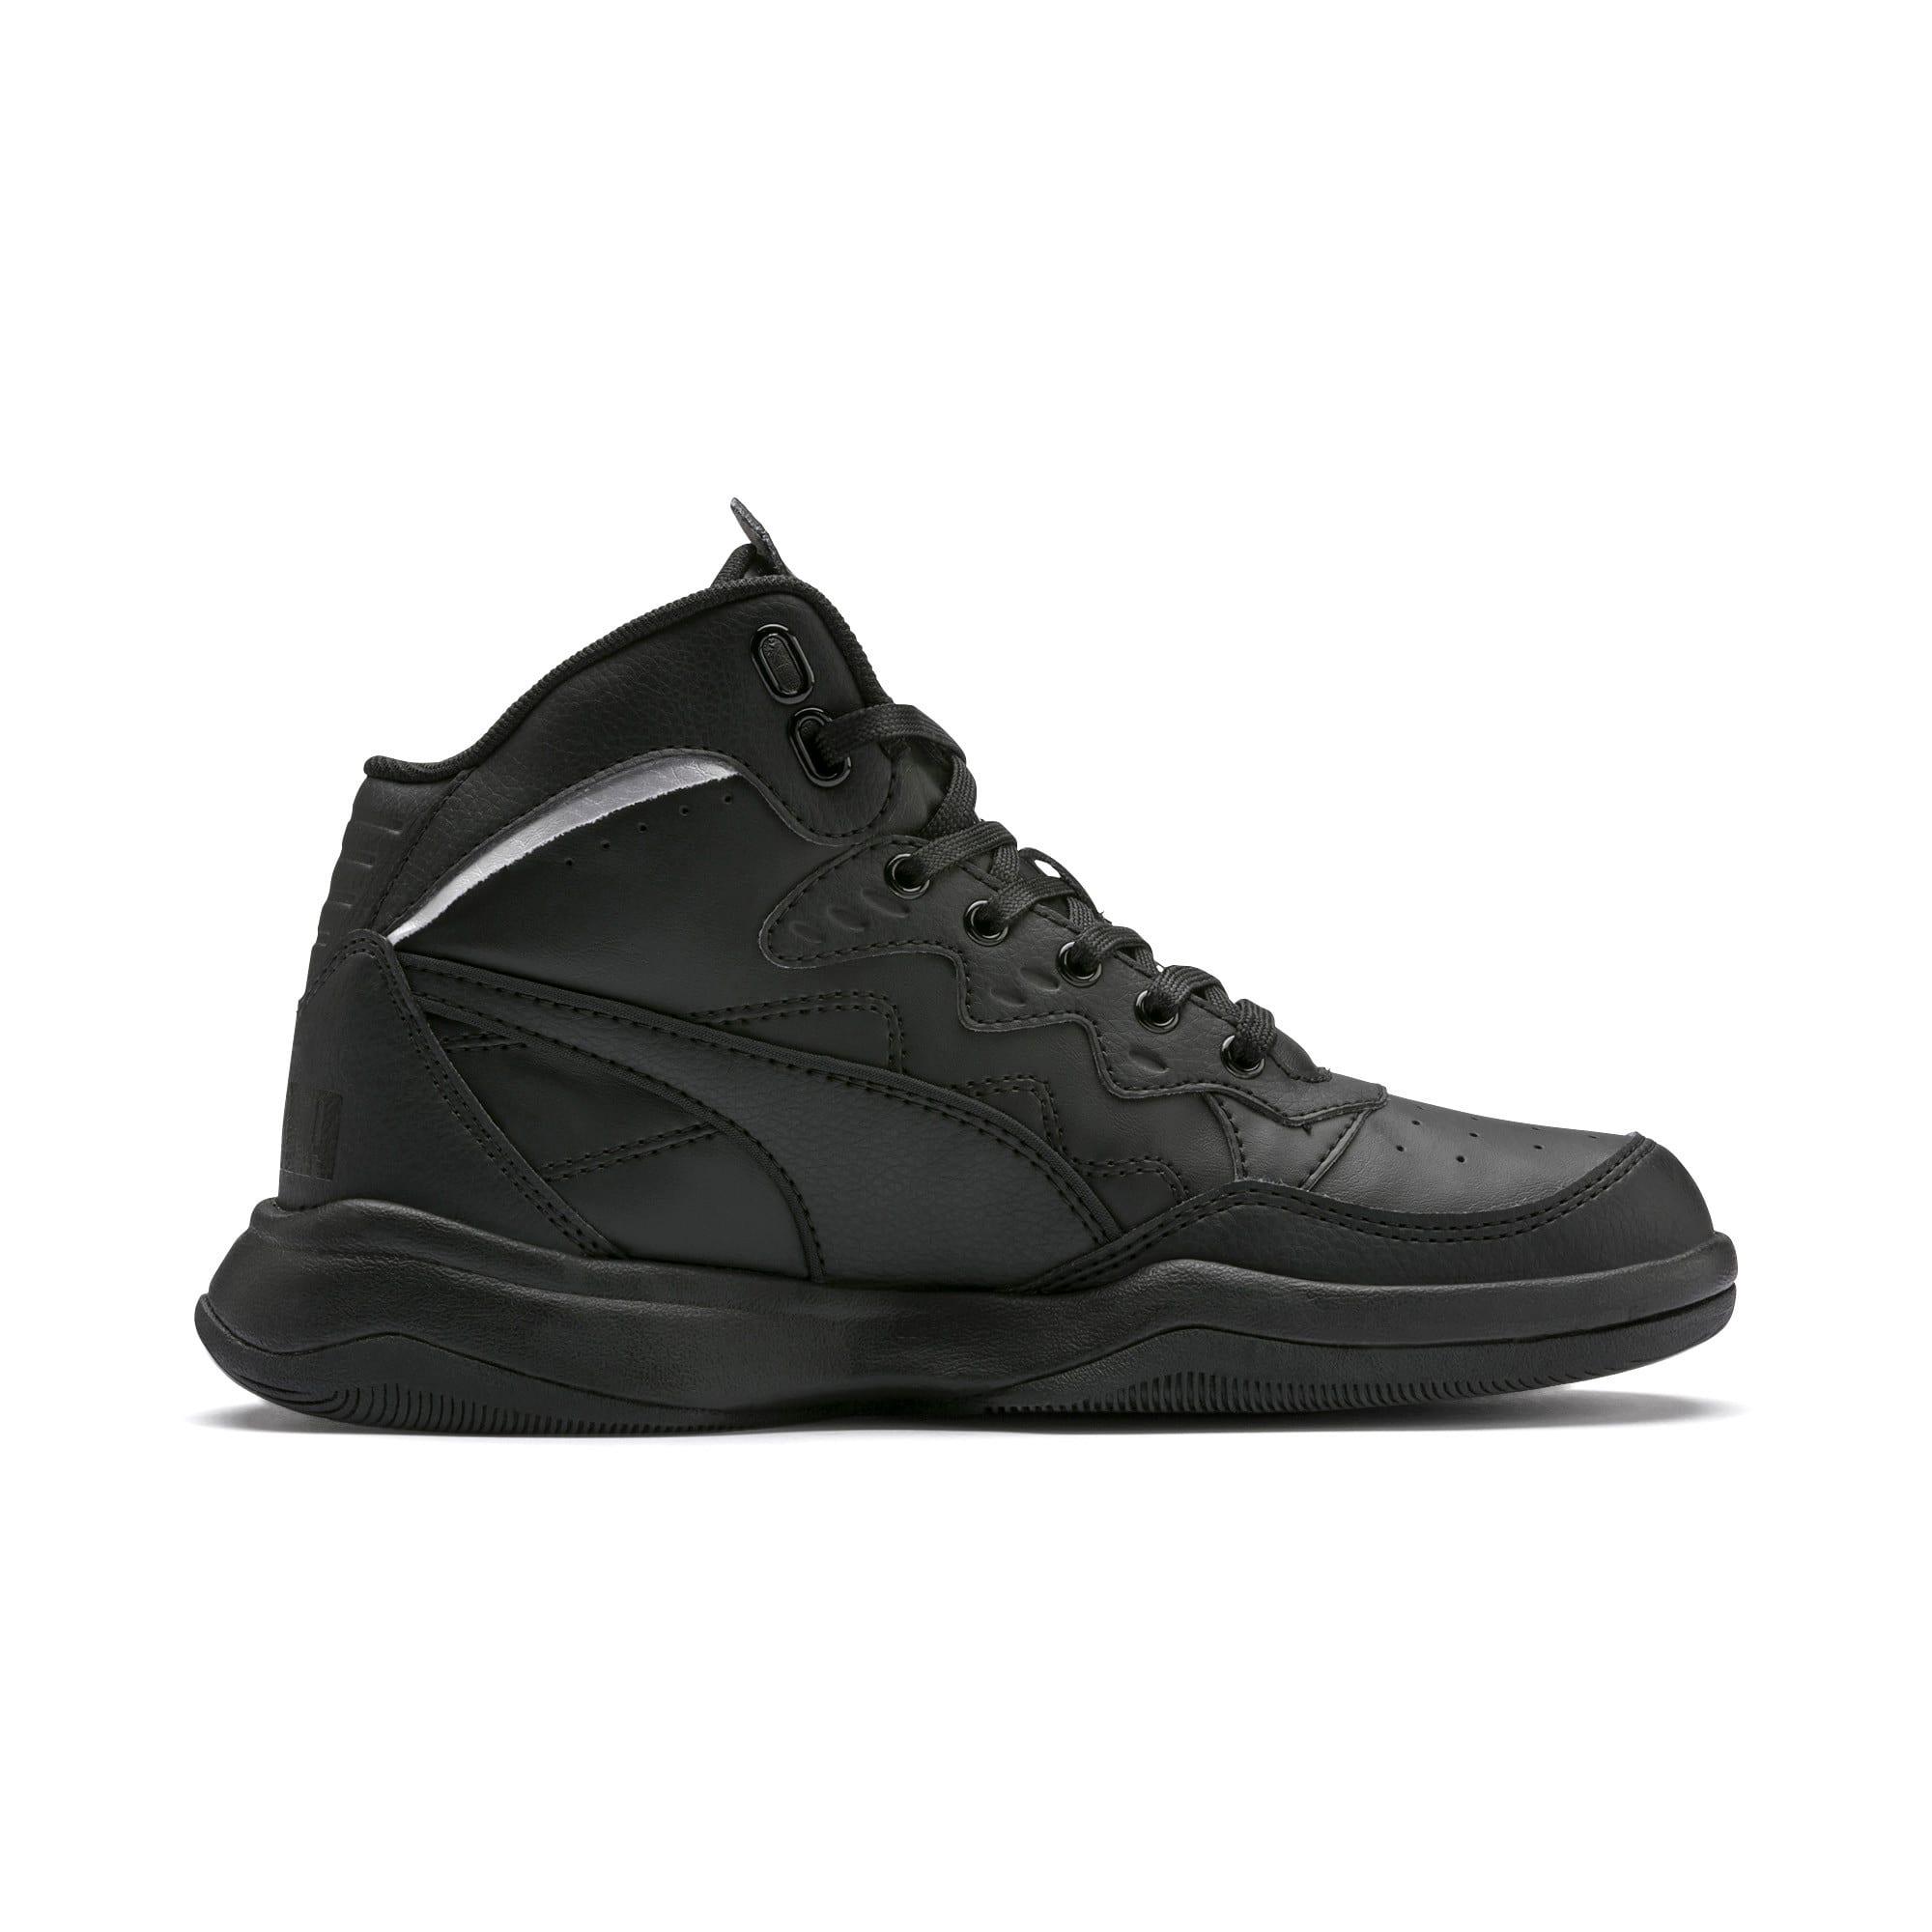 Thumbnail 5 of PUMA Rebound Playoff SL Sneakers JR, Puma Black-Puma Silver, medium